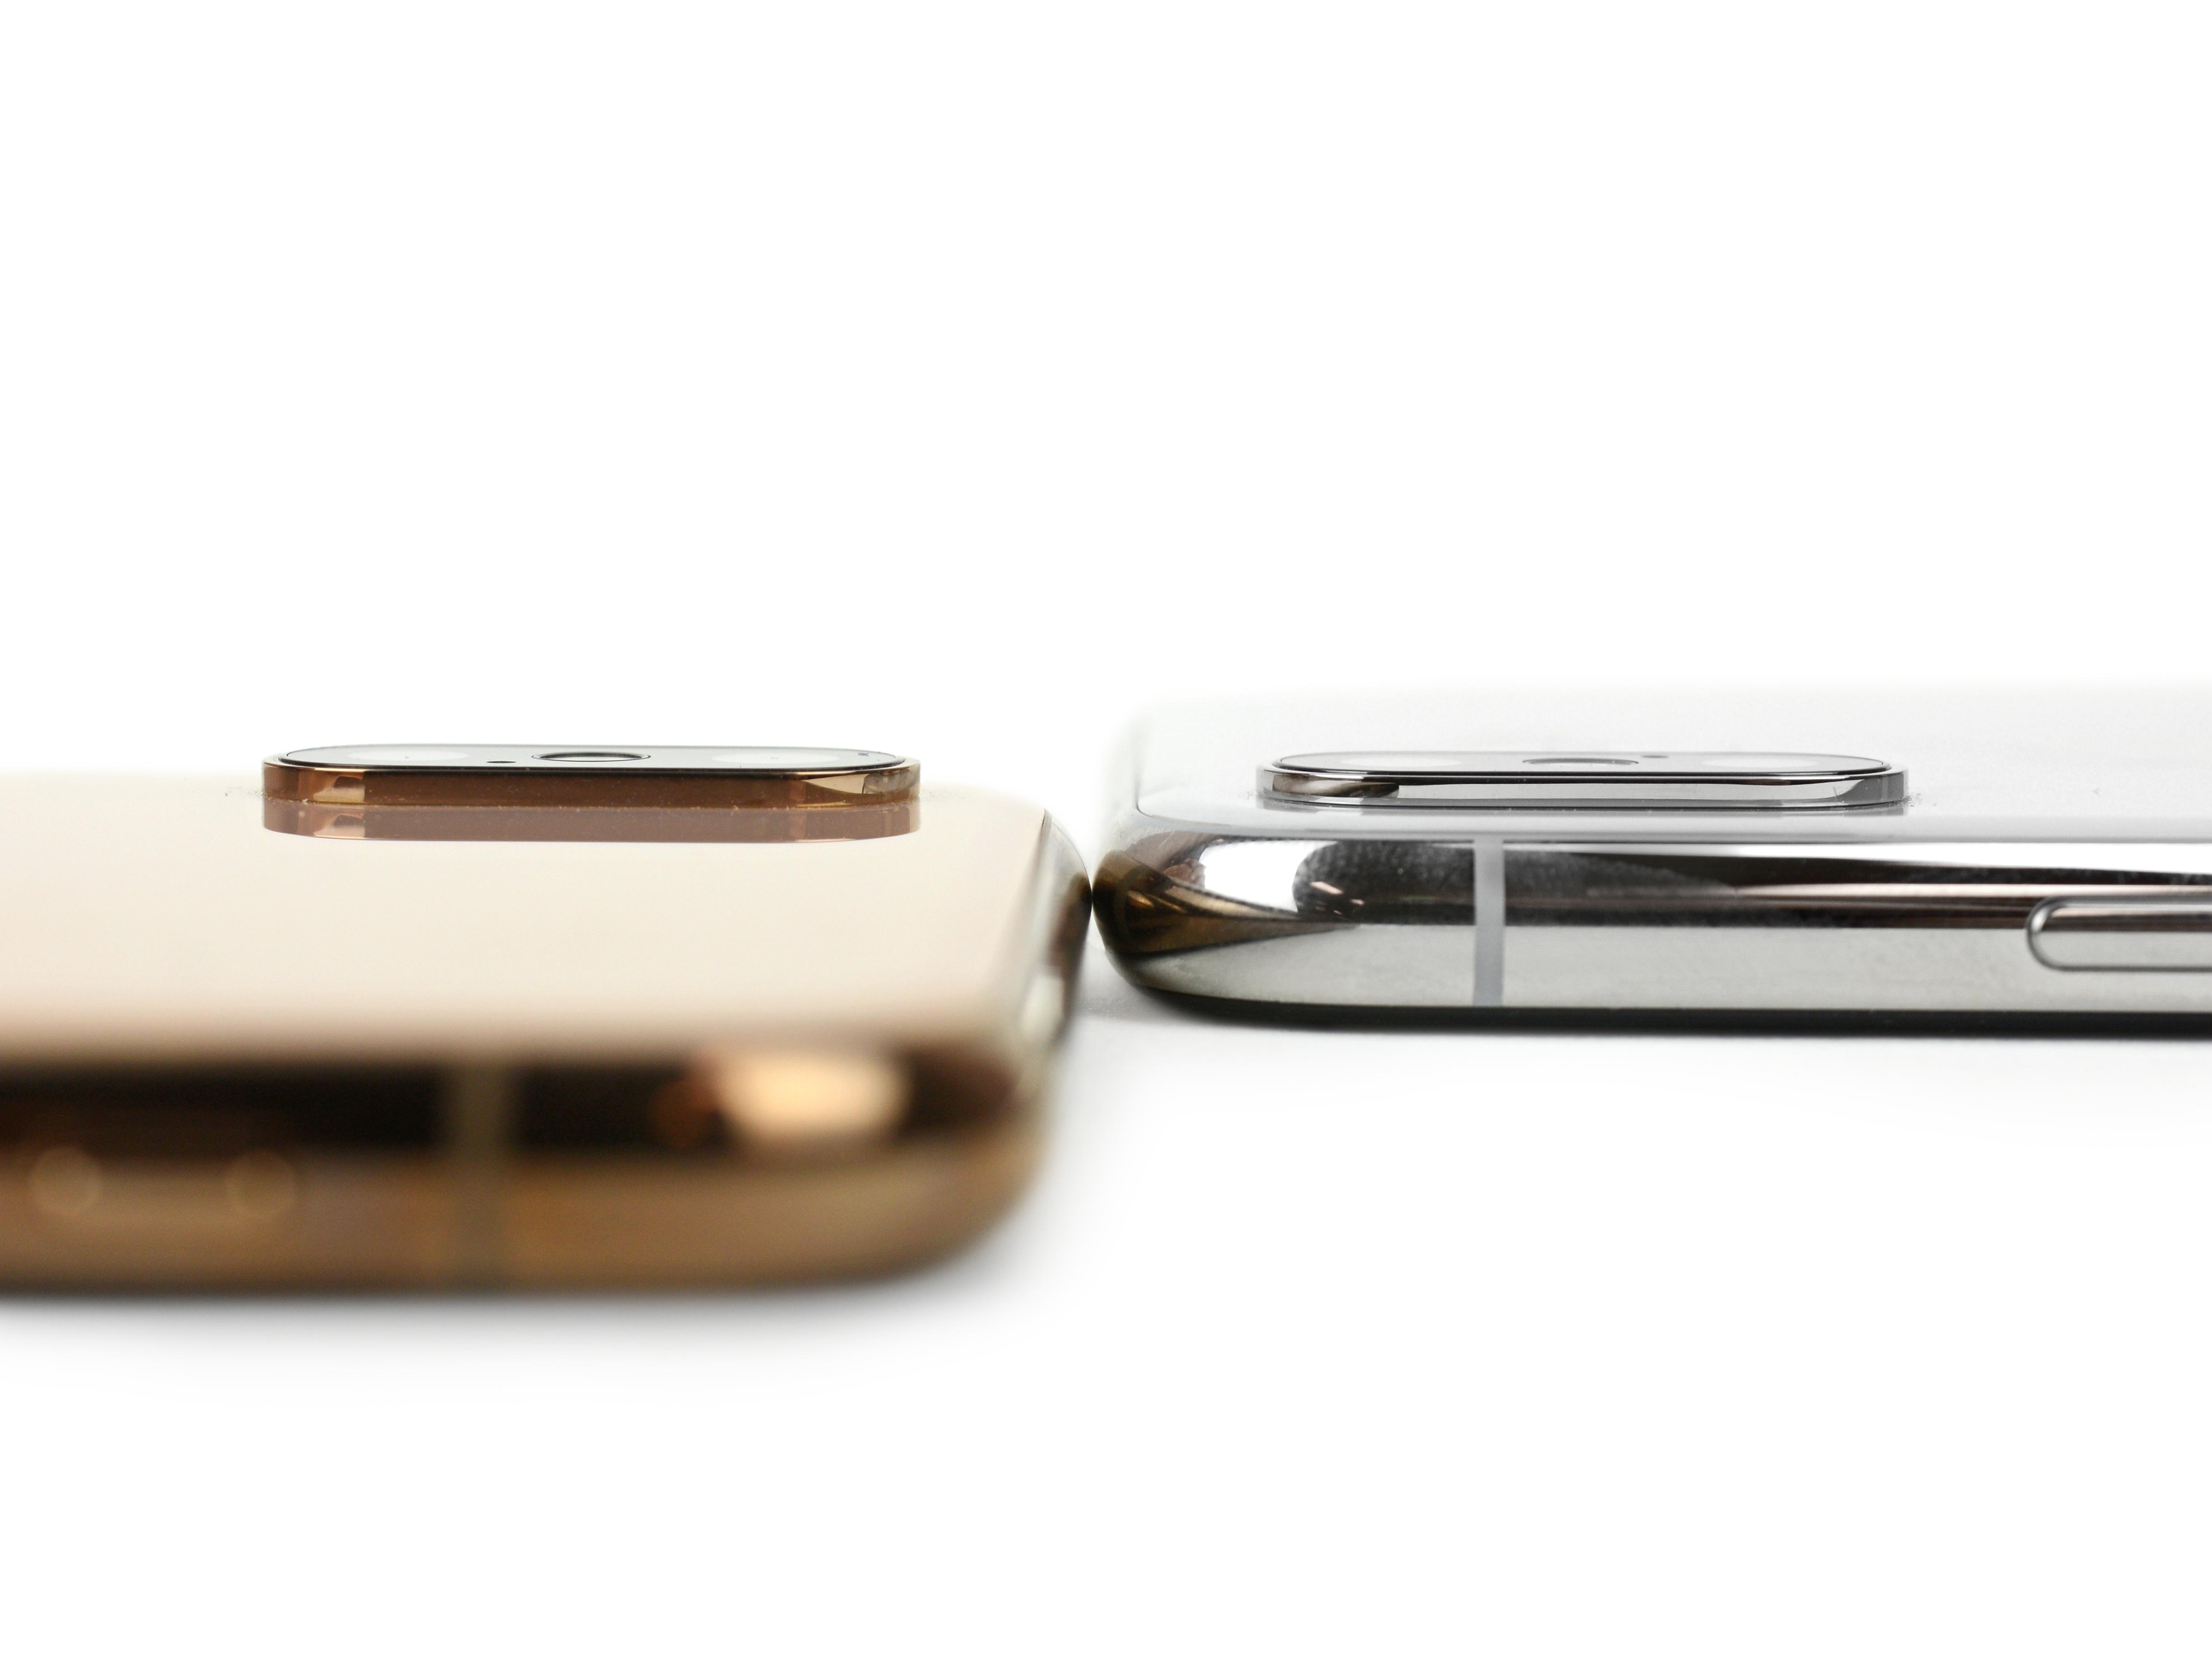 iPhone XS and XS Max Teardown - iFixit